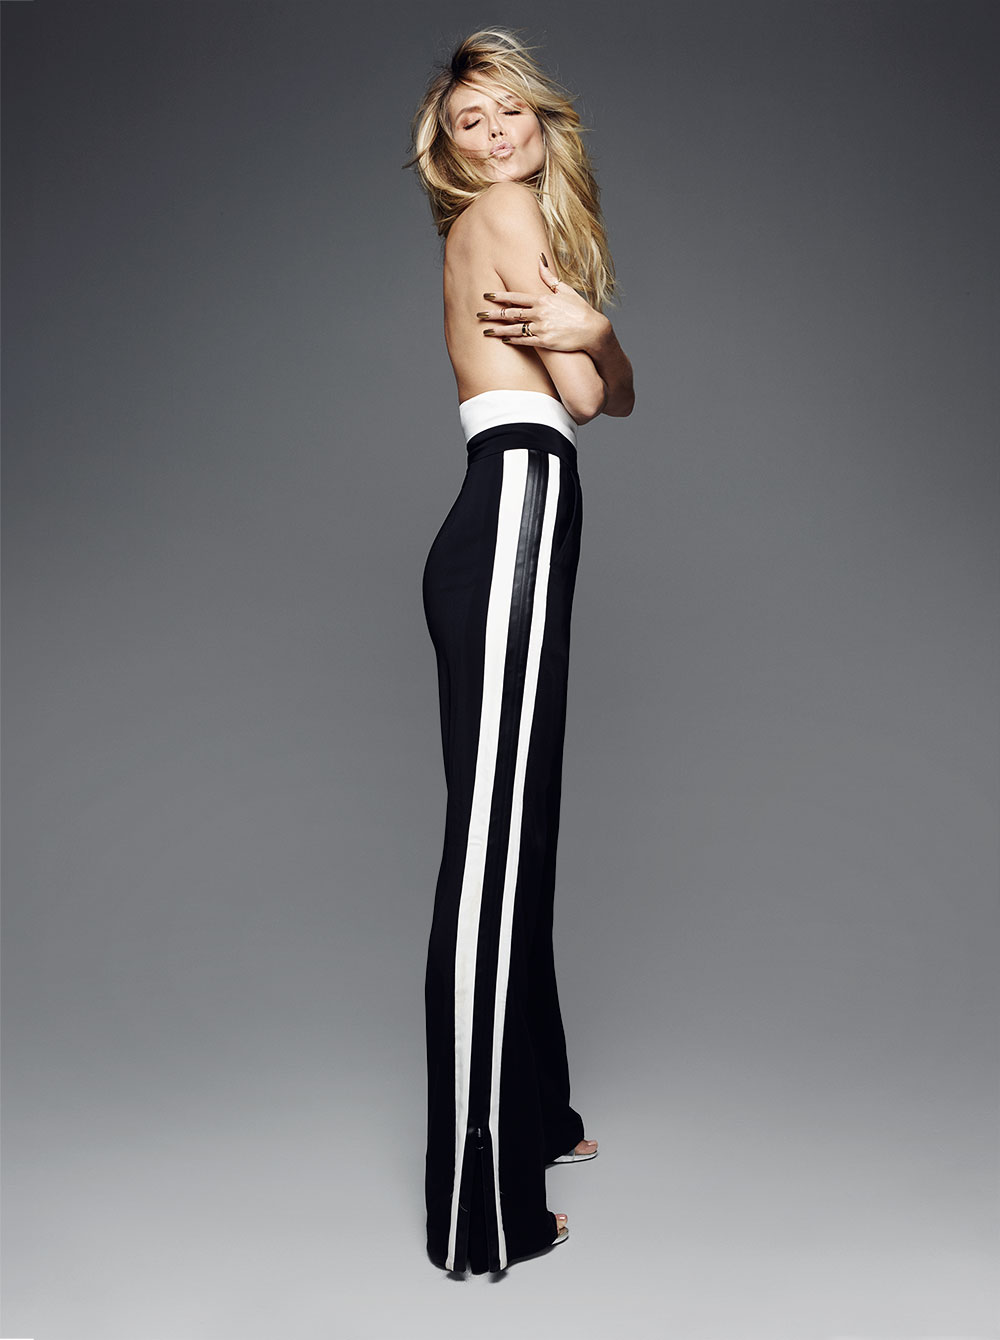 Heidi Klum Shape Magazine